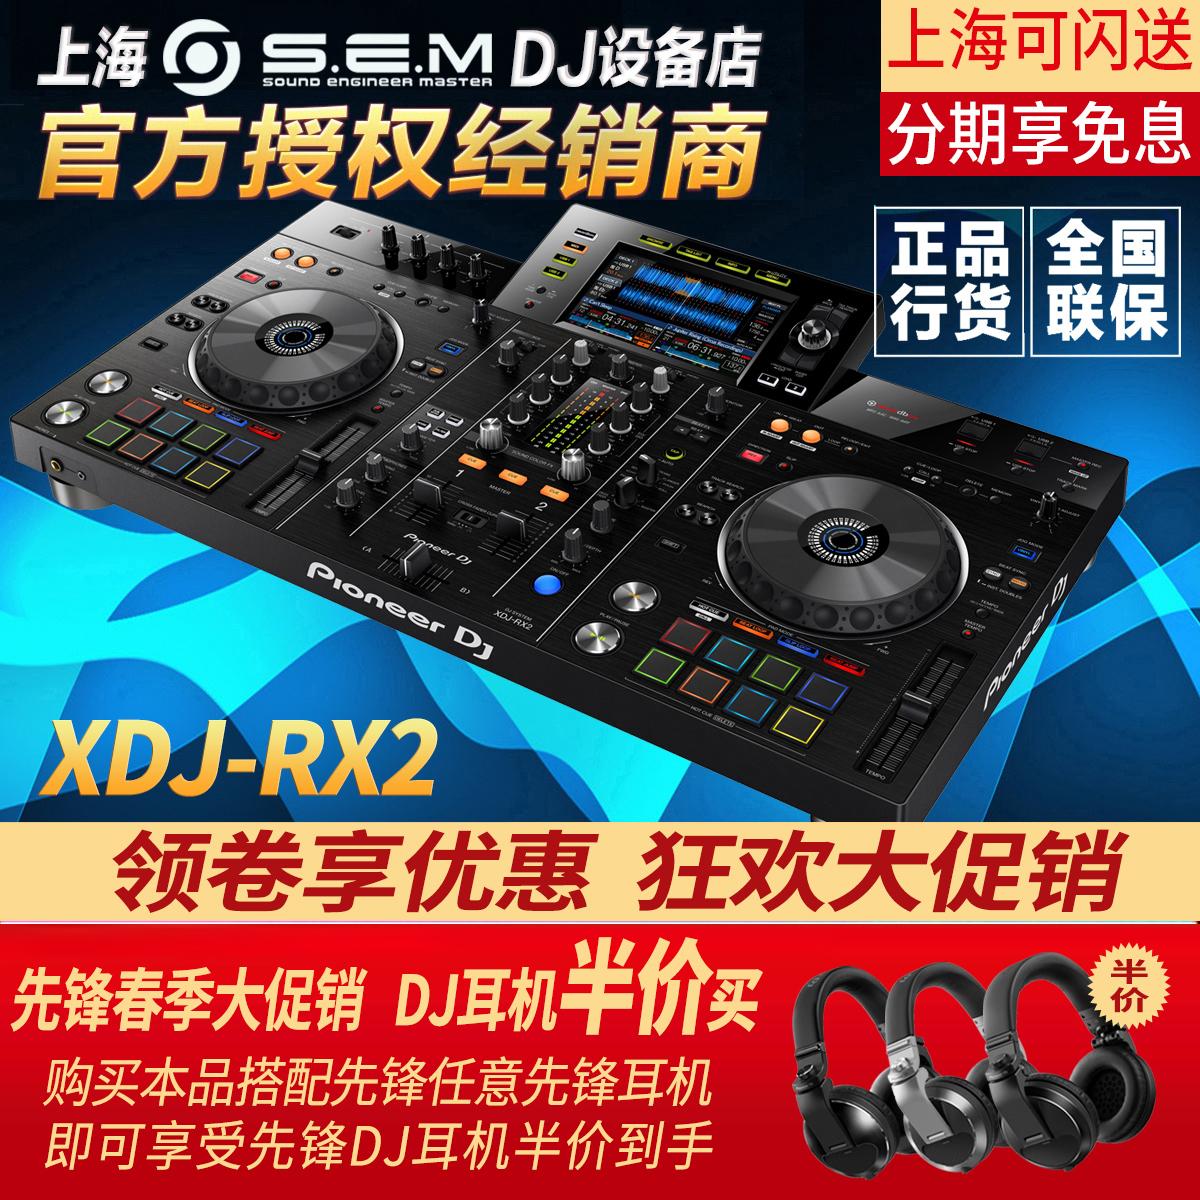 DJ установки / микшеры Артикул 553331591111